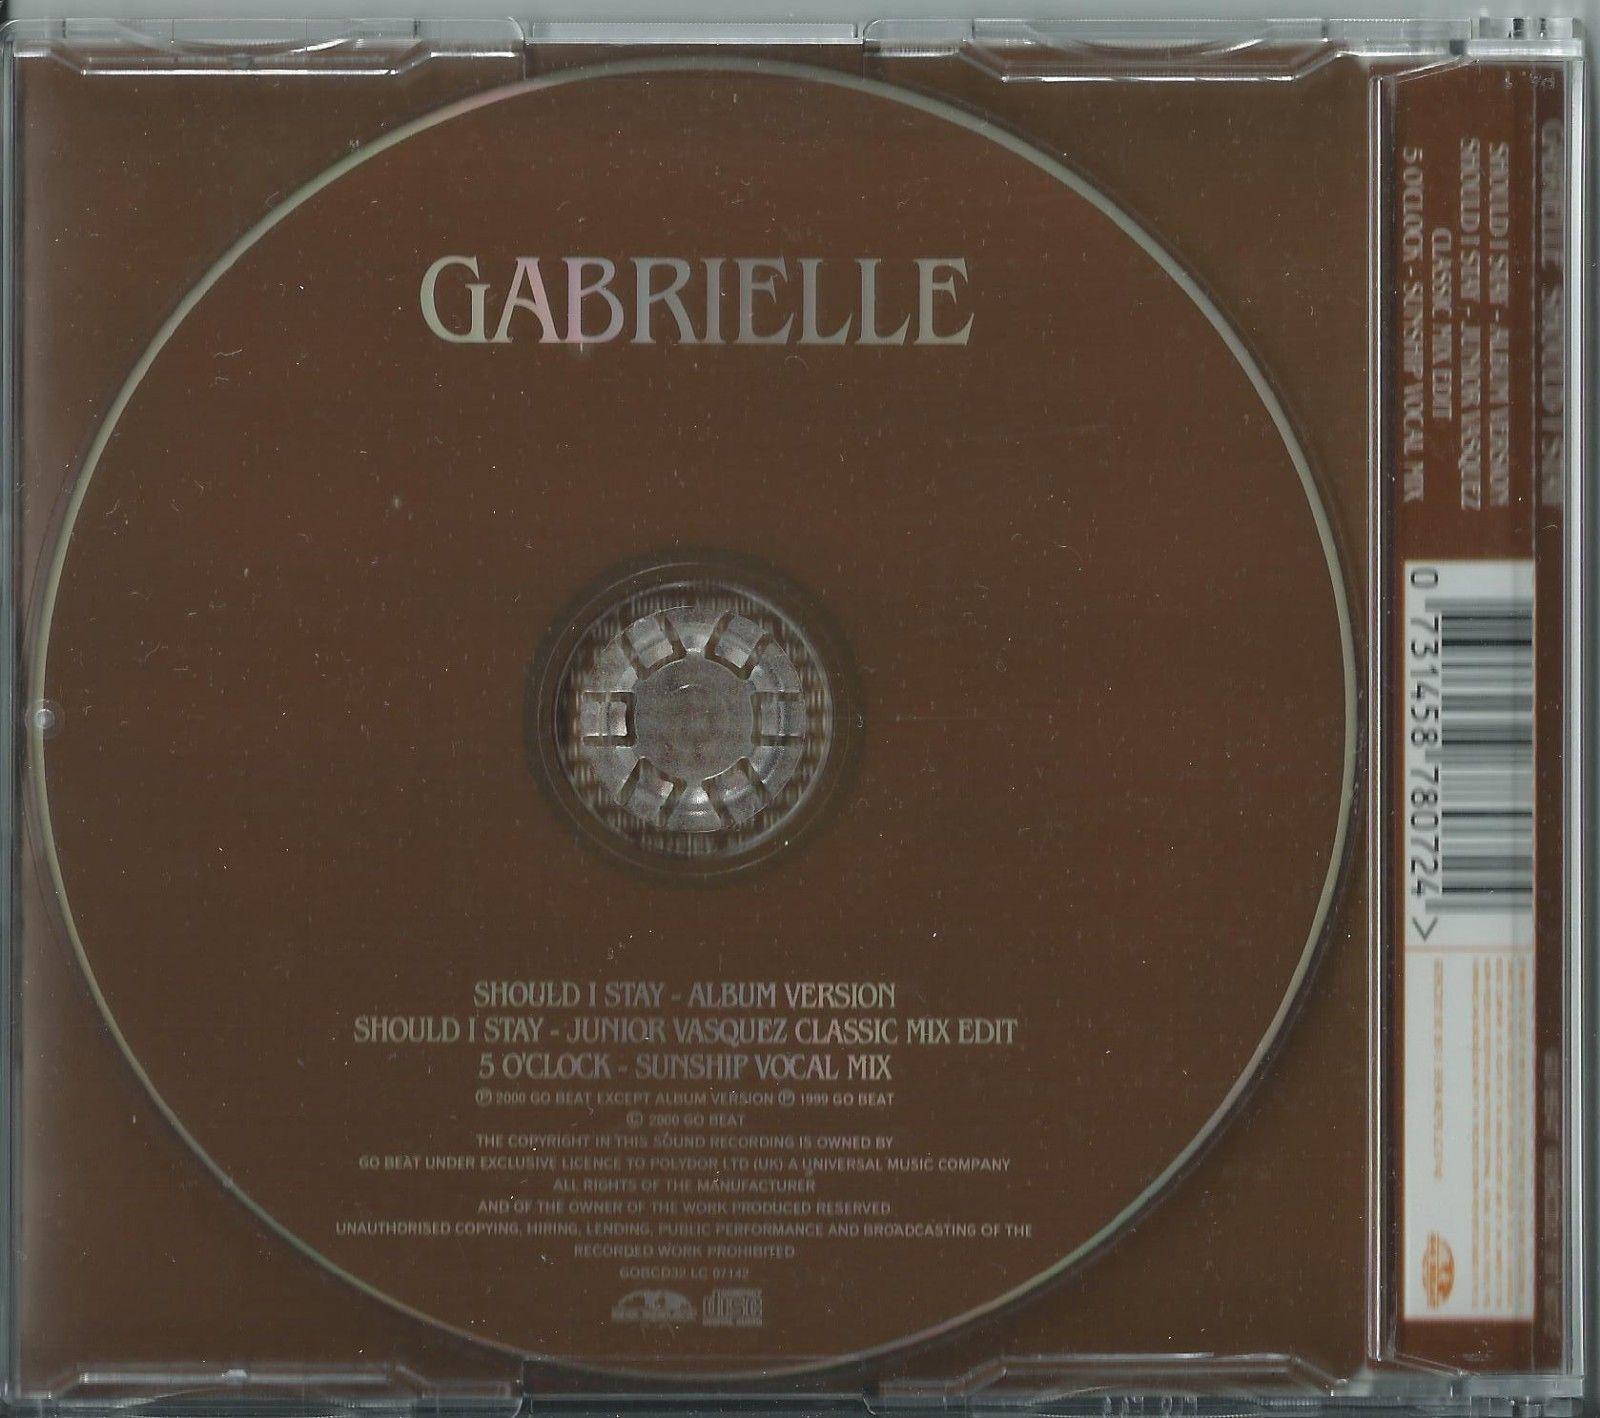 GABRIELLE - SHOULD I STAY /(REMIX) / 5 O'CLOCK (REMIX) 2000 UK CD SINGLE GOBCD32